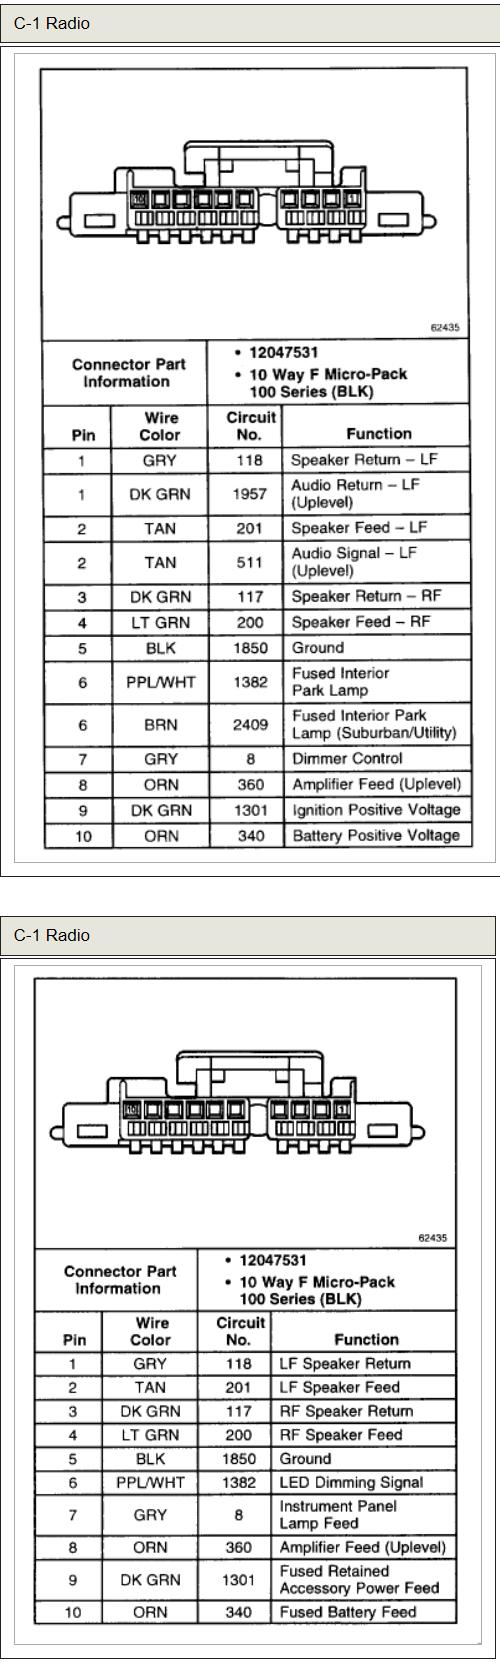 Chevrolet Car Radio Stereo Audio Wiring Diagram Autoradio Connector - 2004 Chevy Tahoe Radio Wiring Diagram